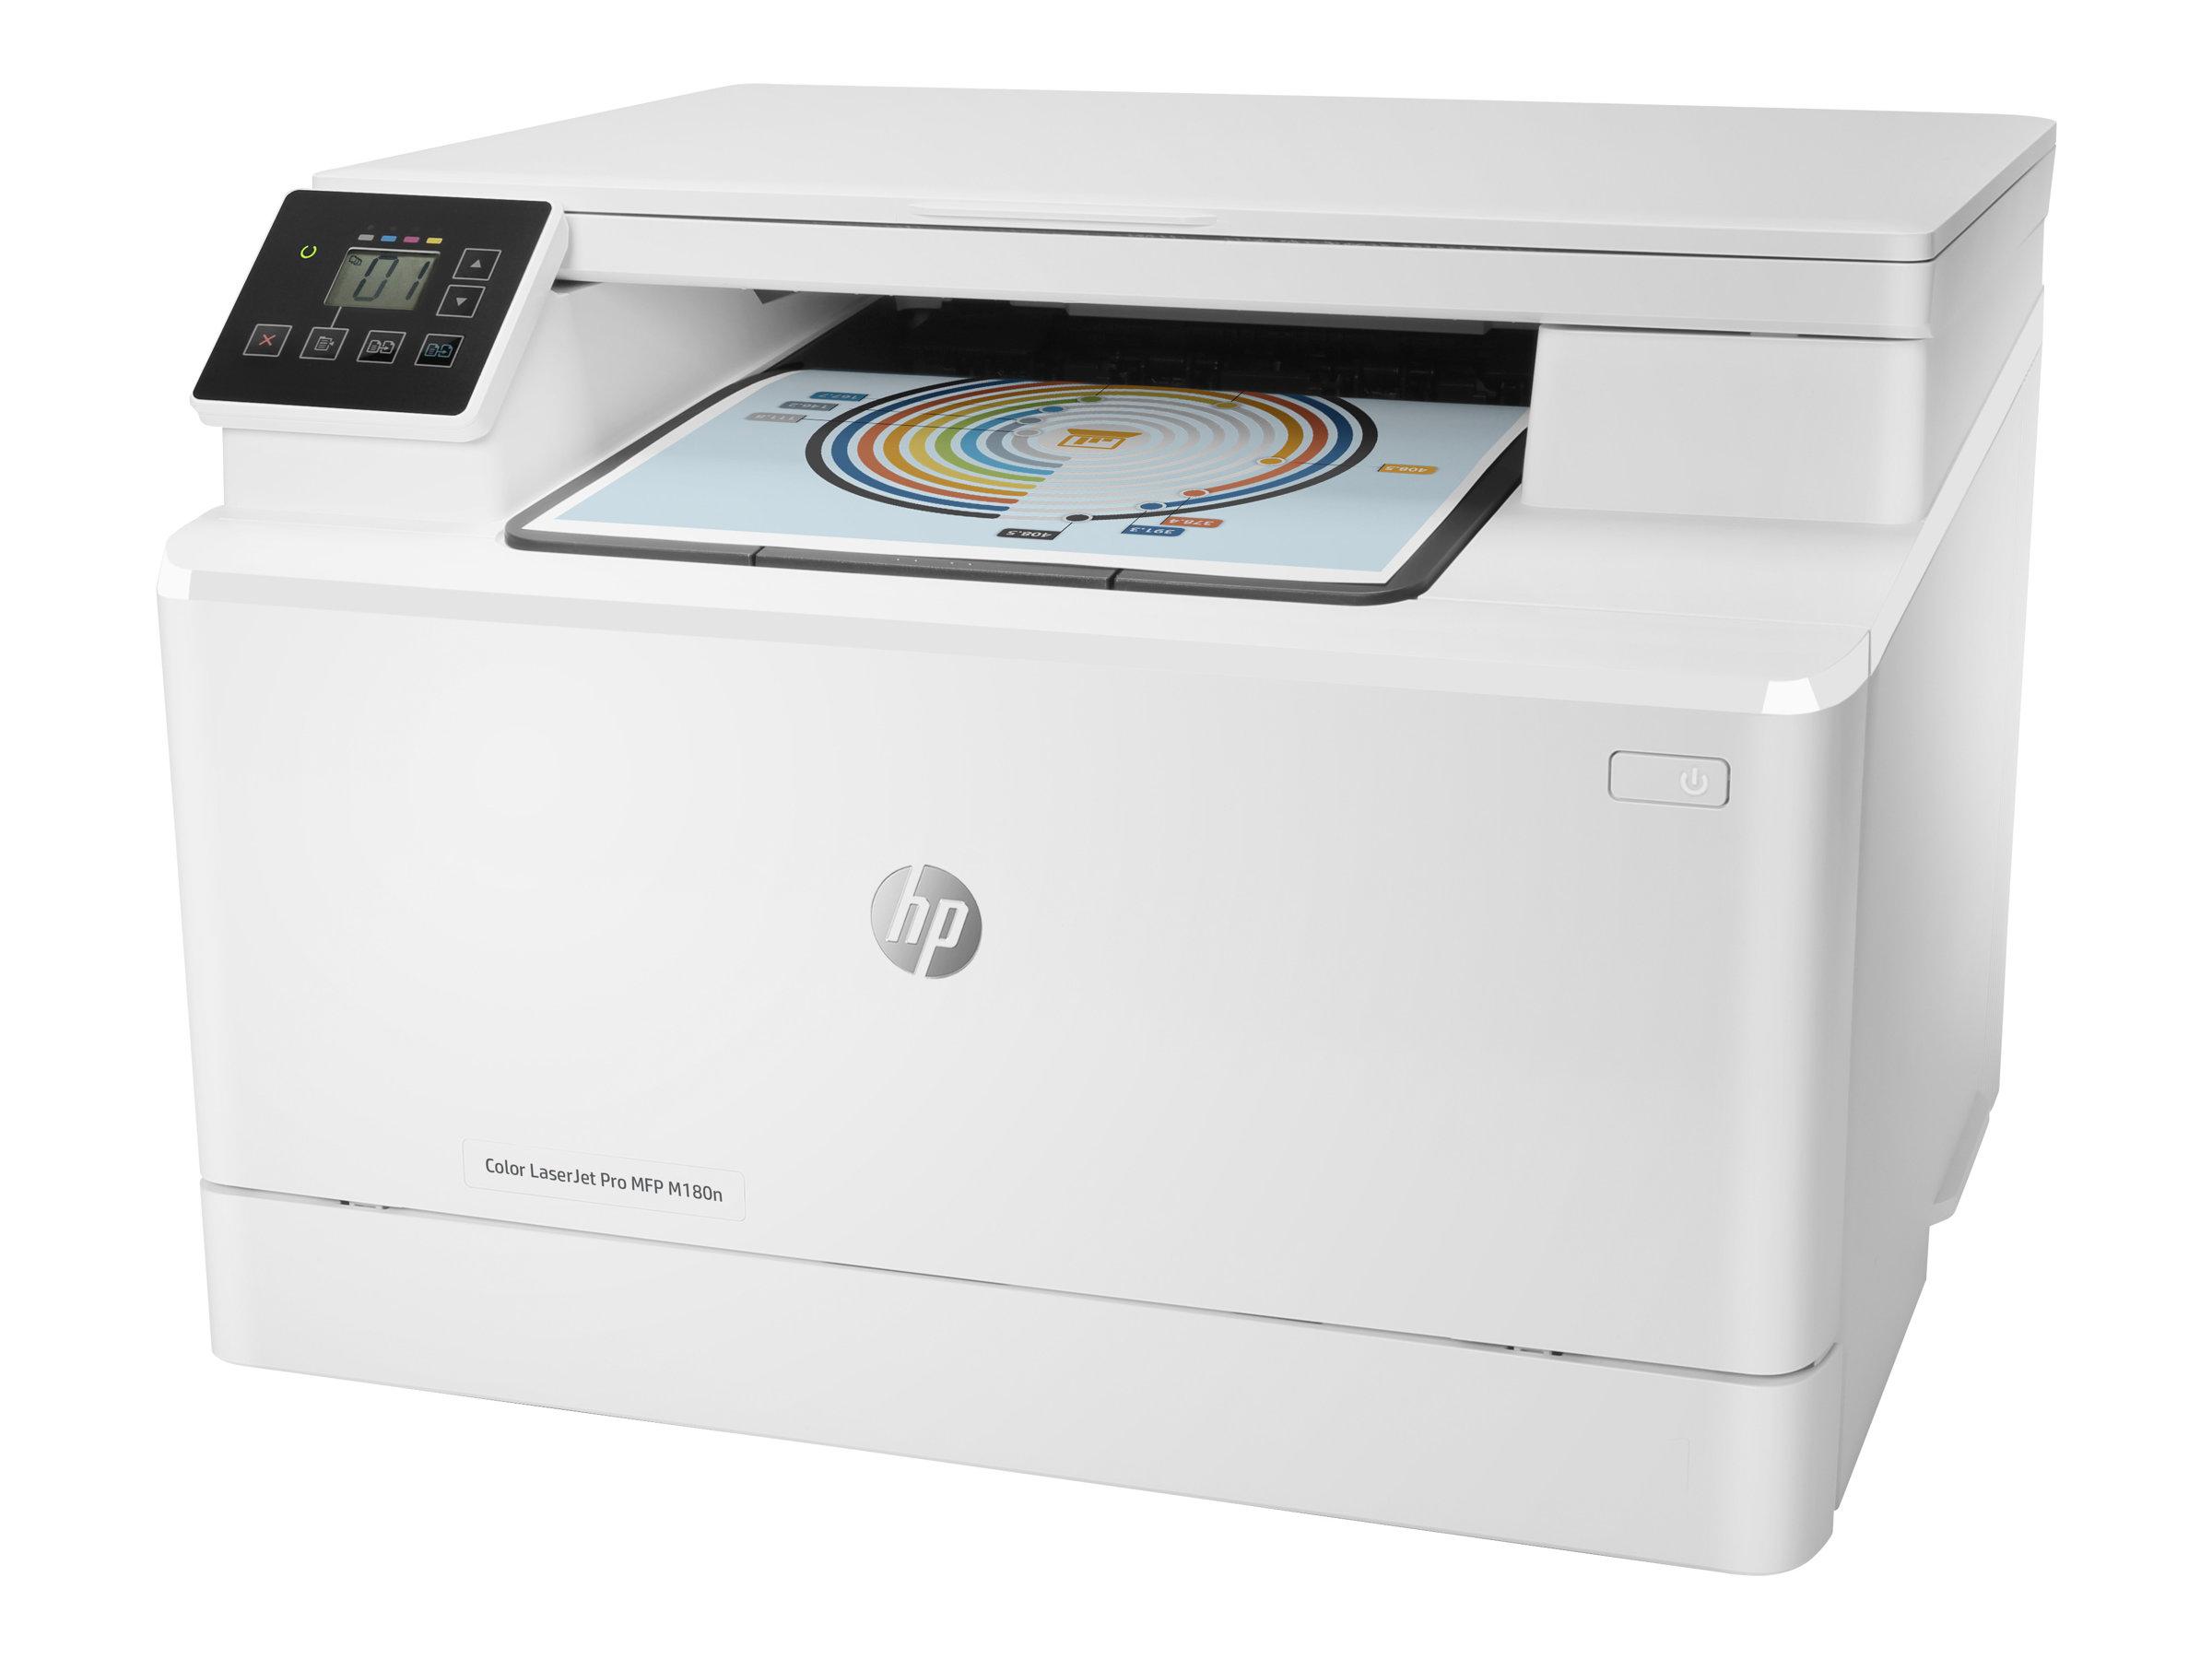 HP Color LaserJet Pro MFP M180n - Multifunktionsdrucker - Farbe - Laser - 215.9 x 297 mm (Original) - A4/Legal (Medien)